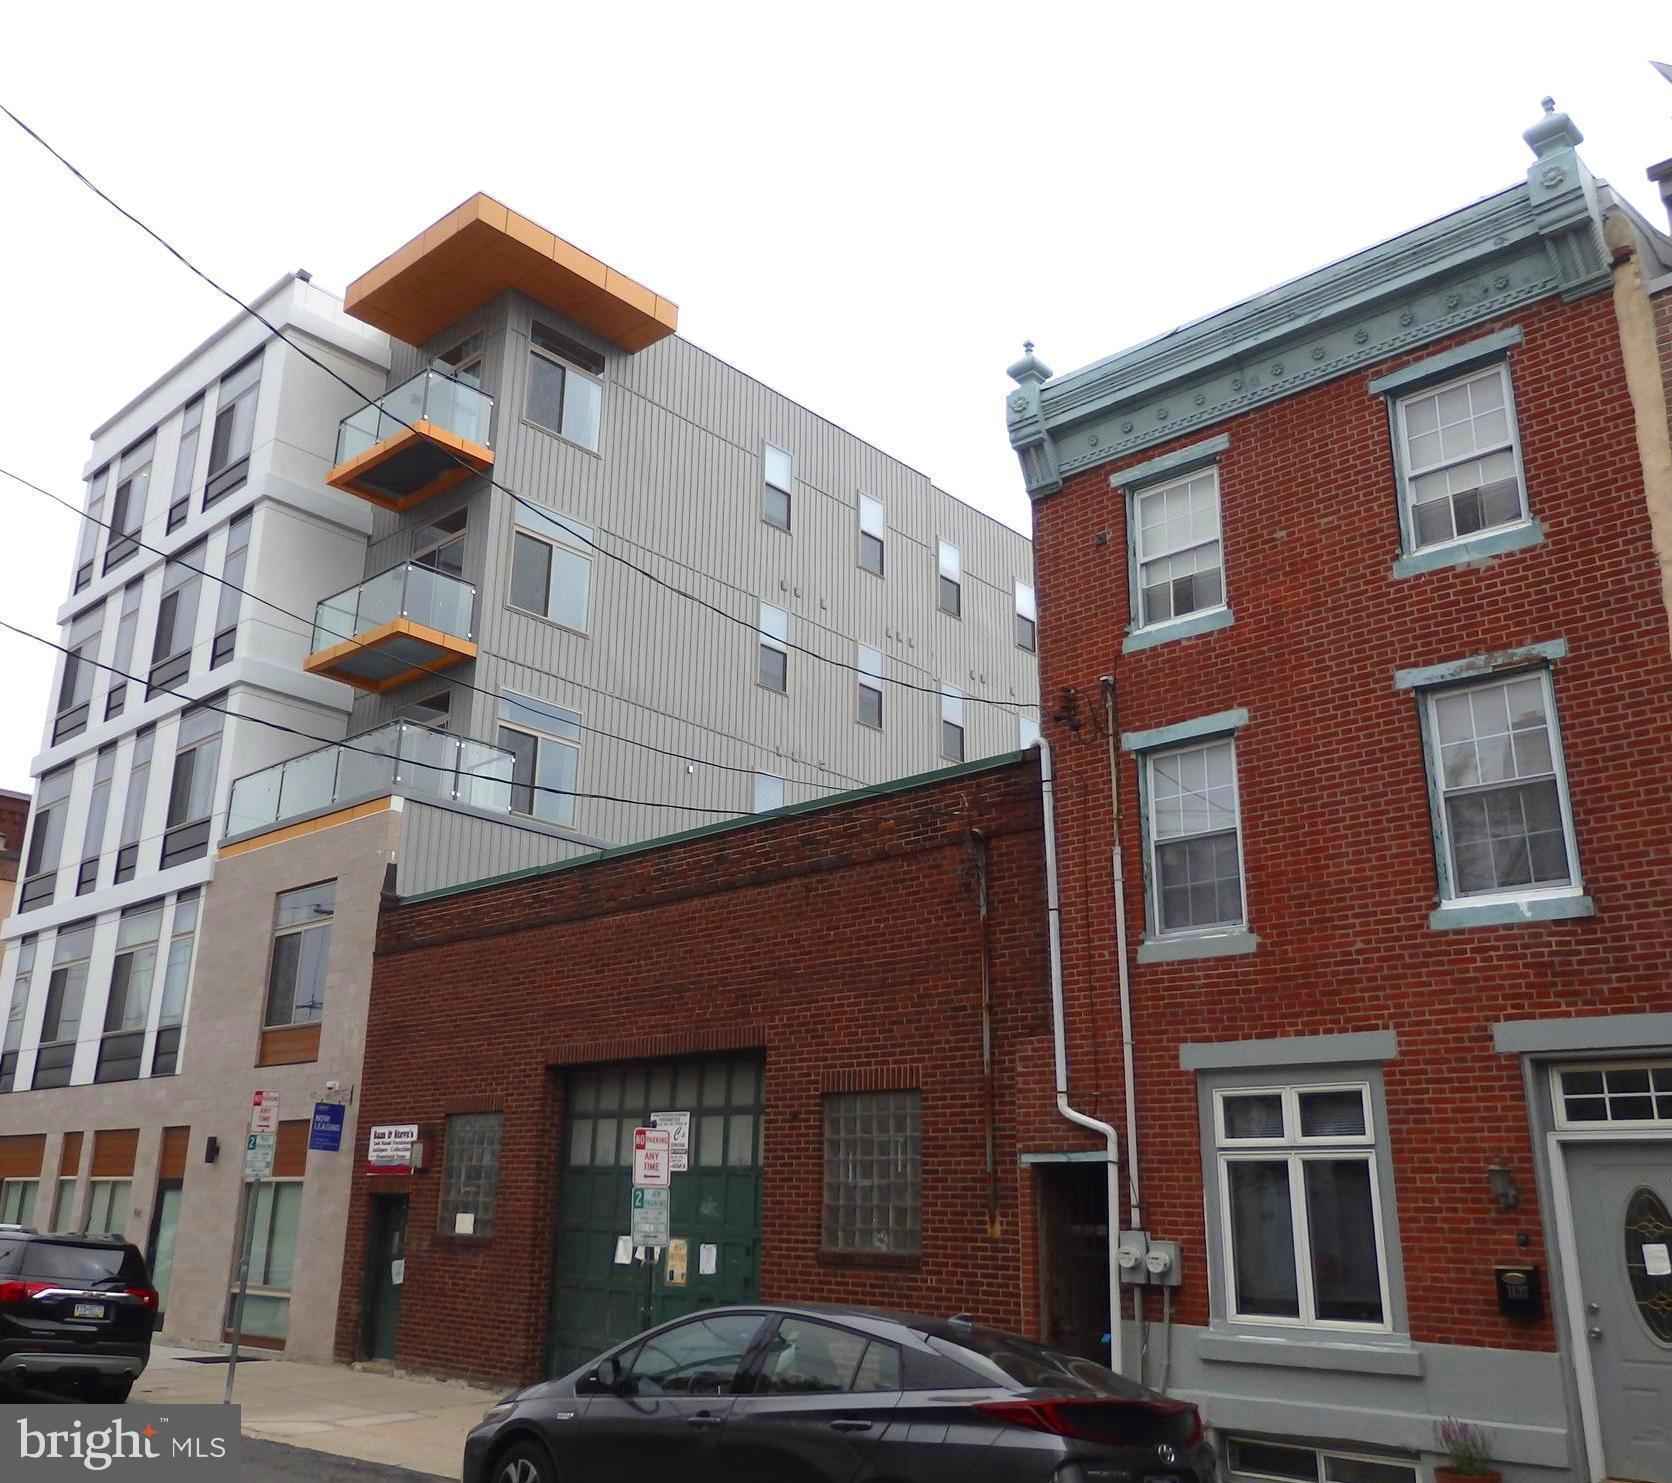 1139-41 N 3rd St, Philadelphia, PA, 19123